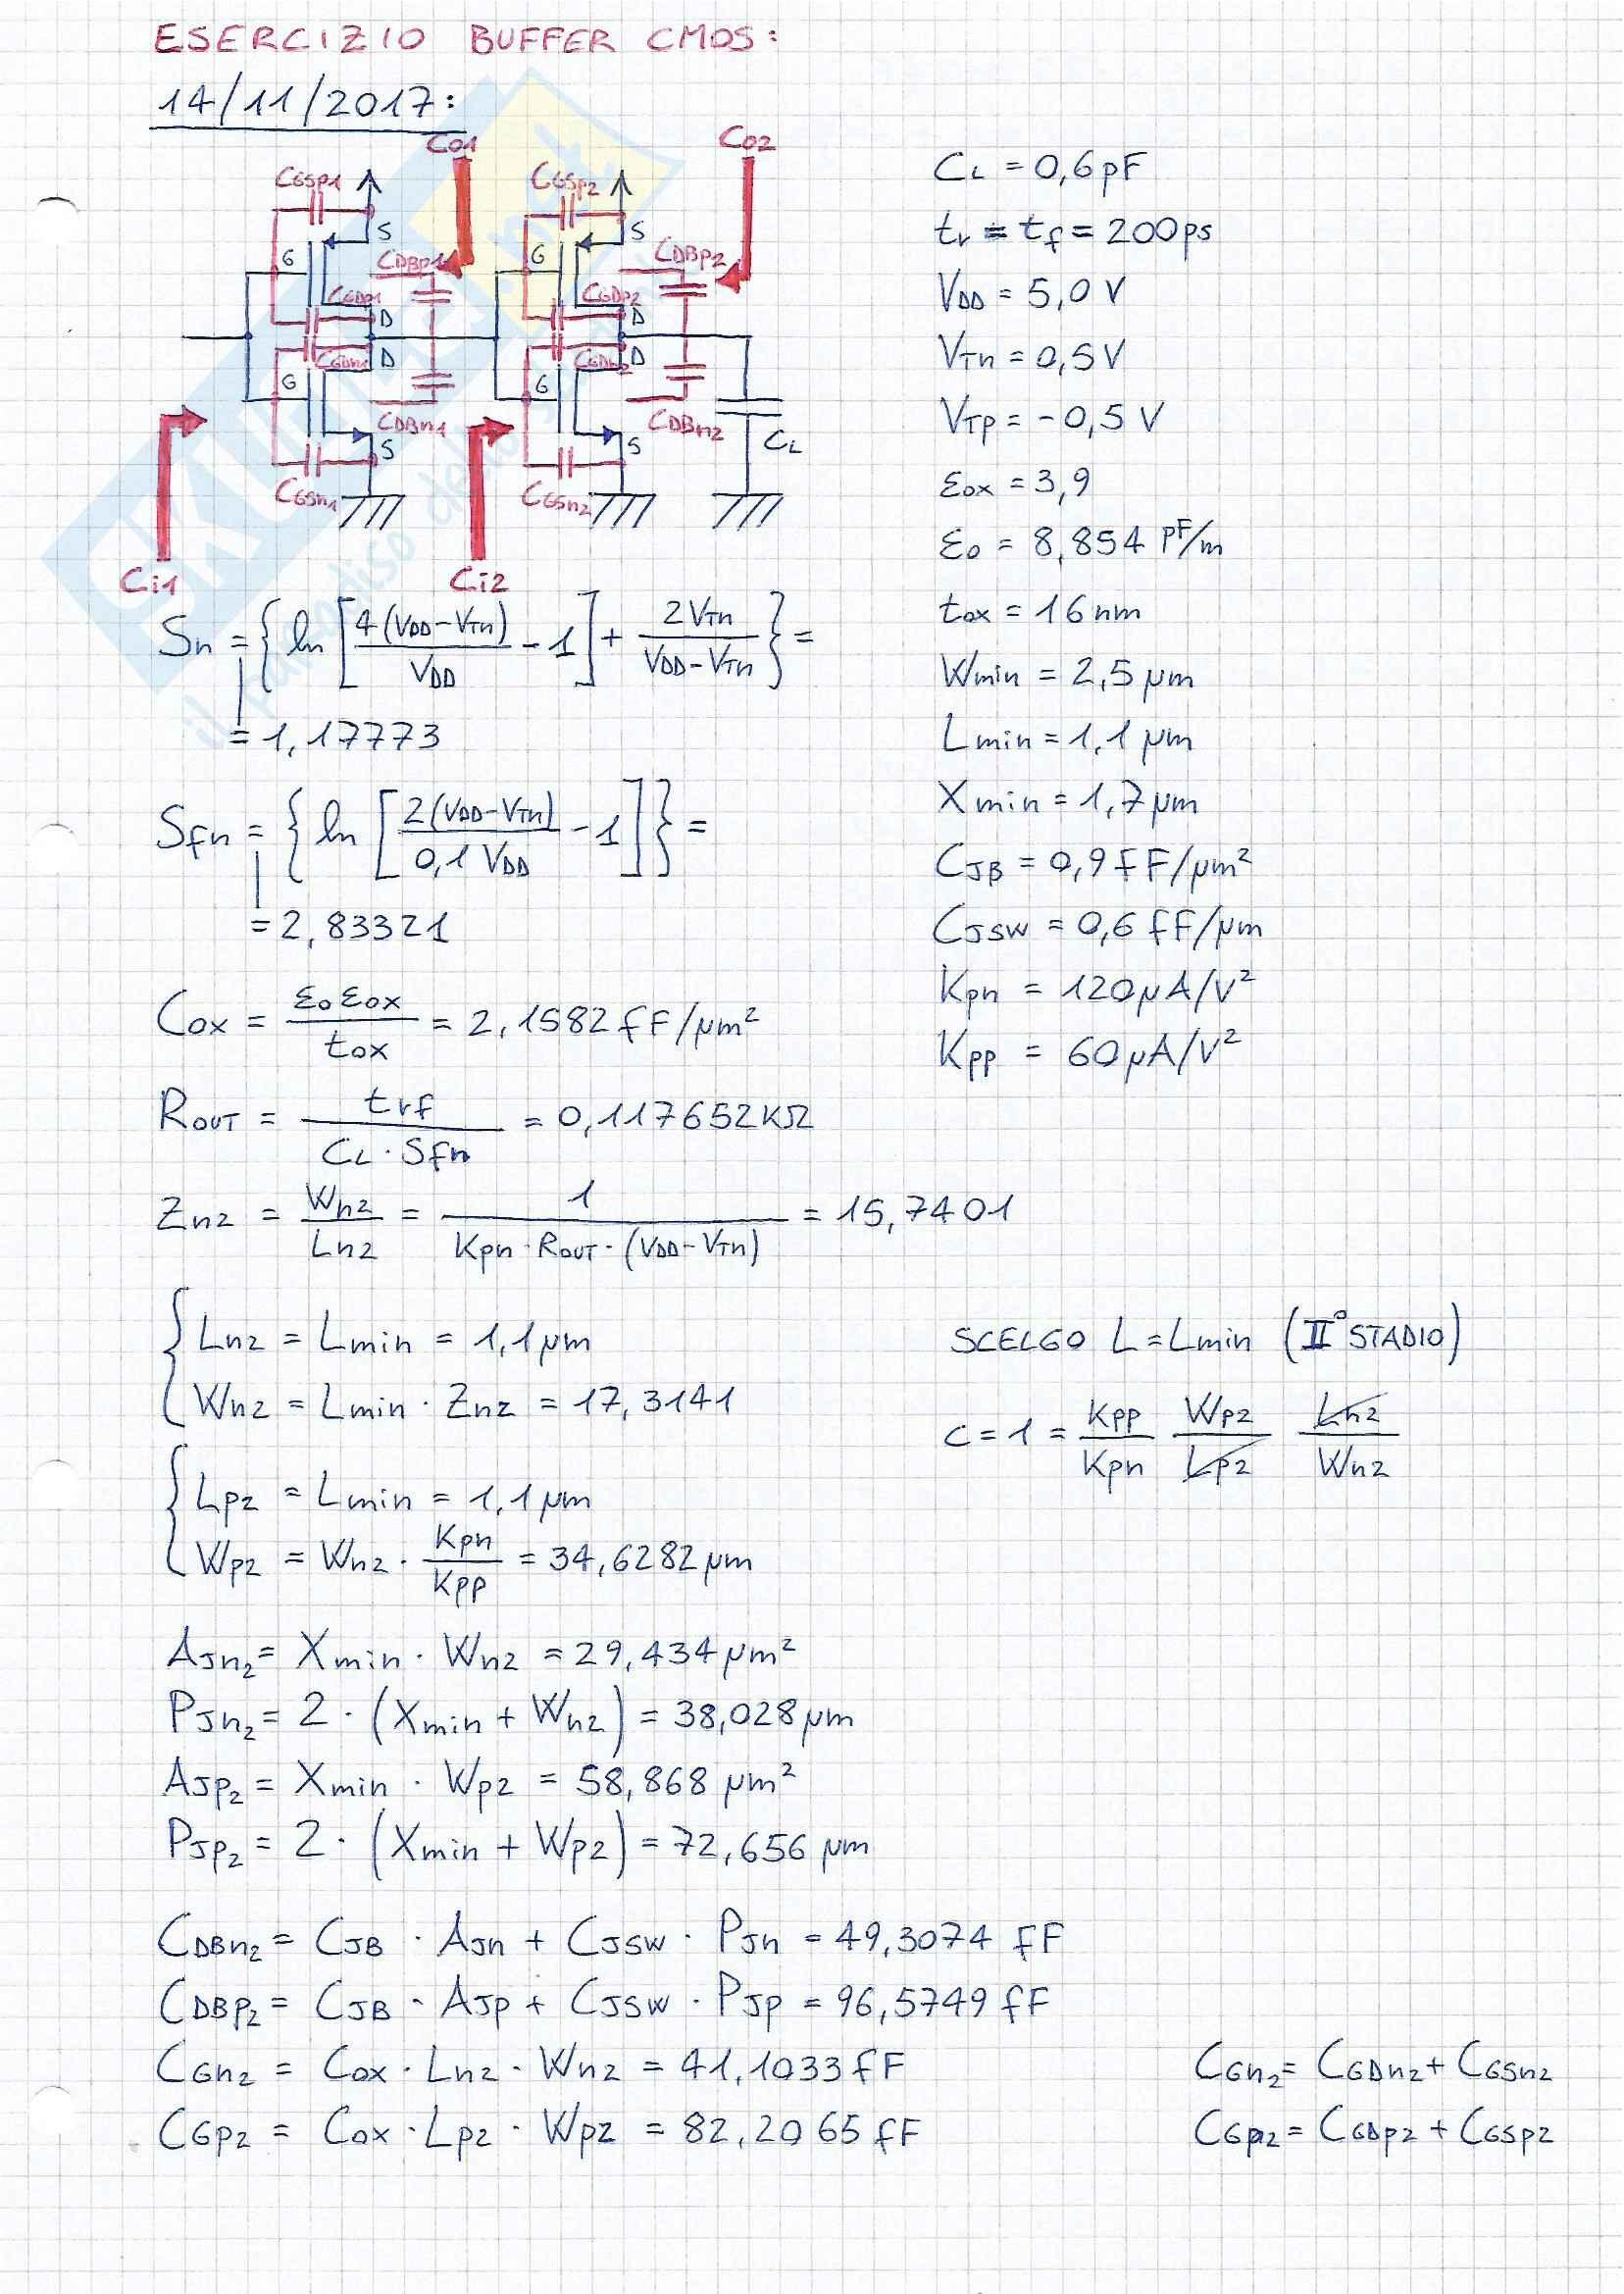 Elettronica Digitale, Prof. Giorgio Biagetti, Esercizi d'esame